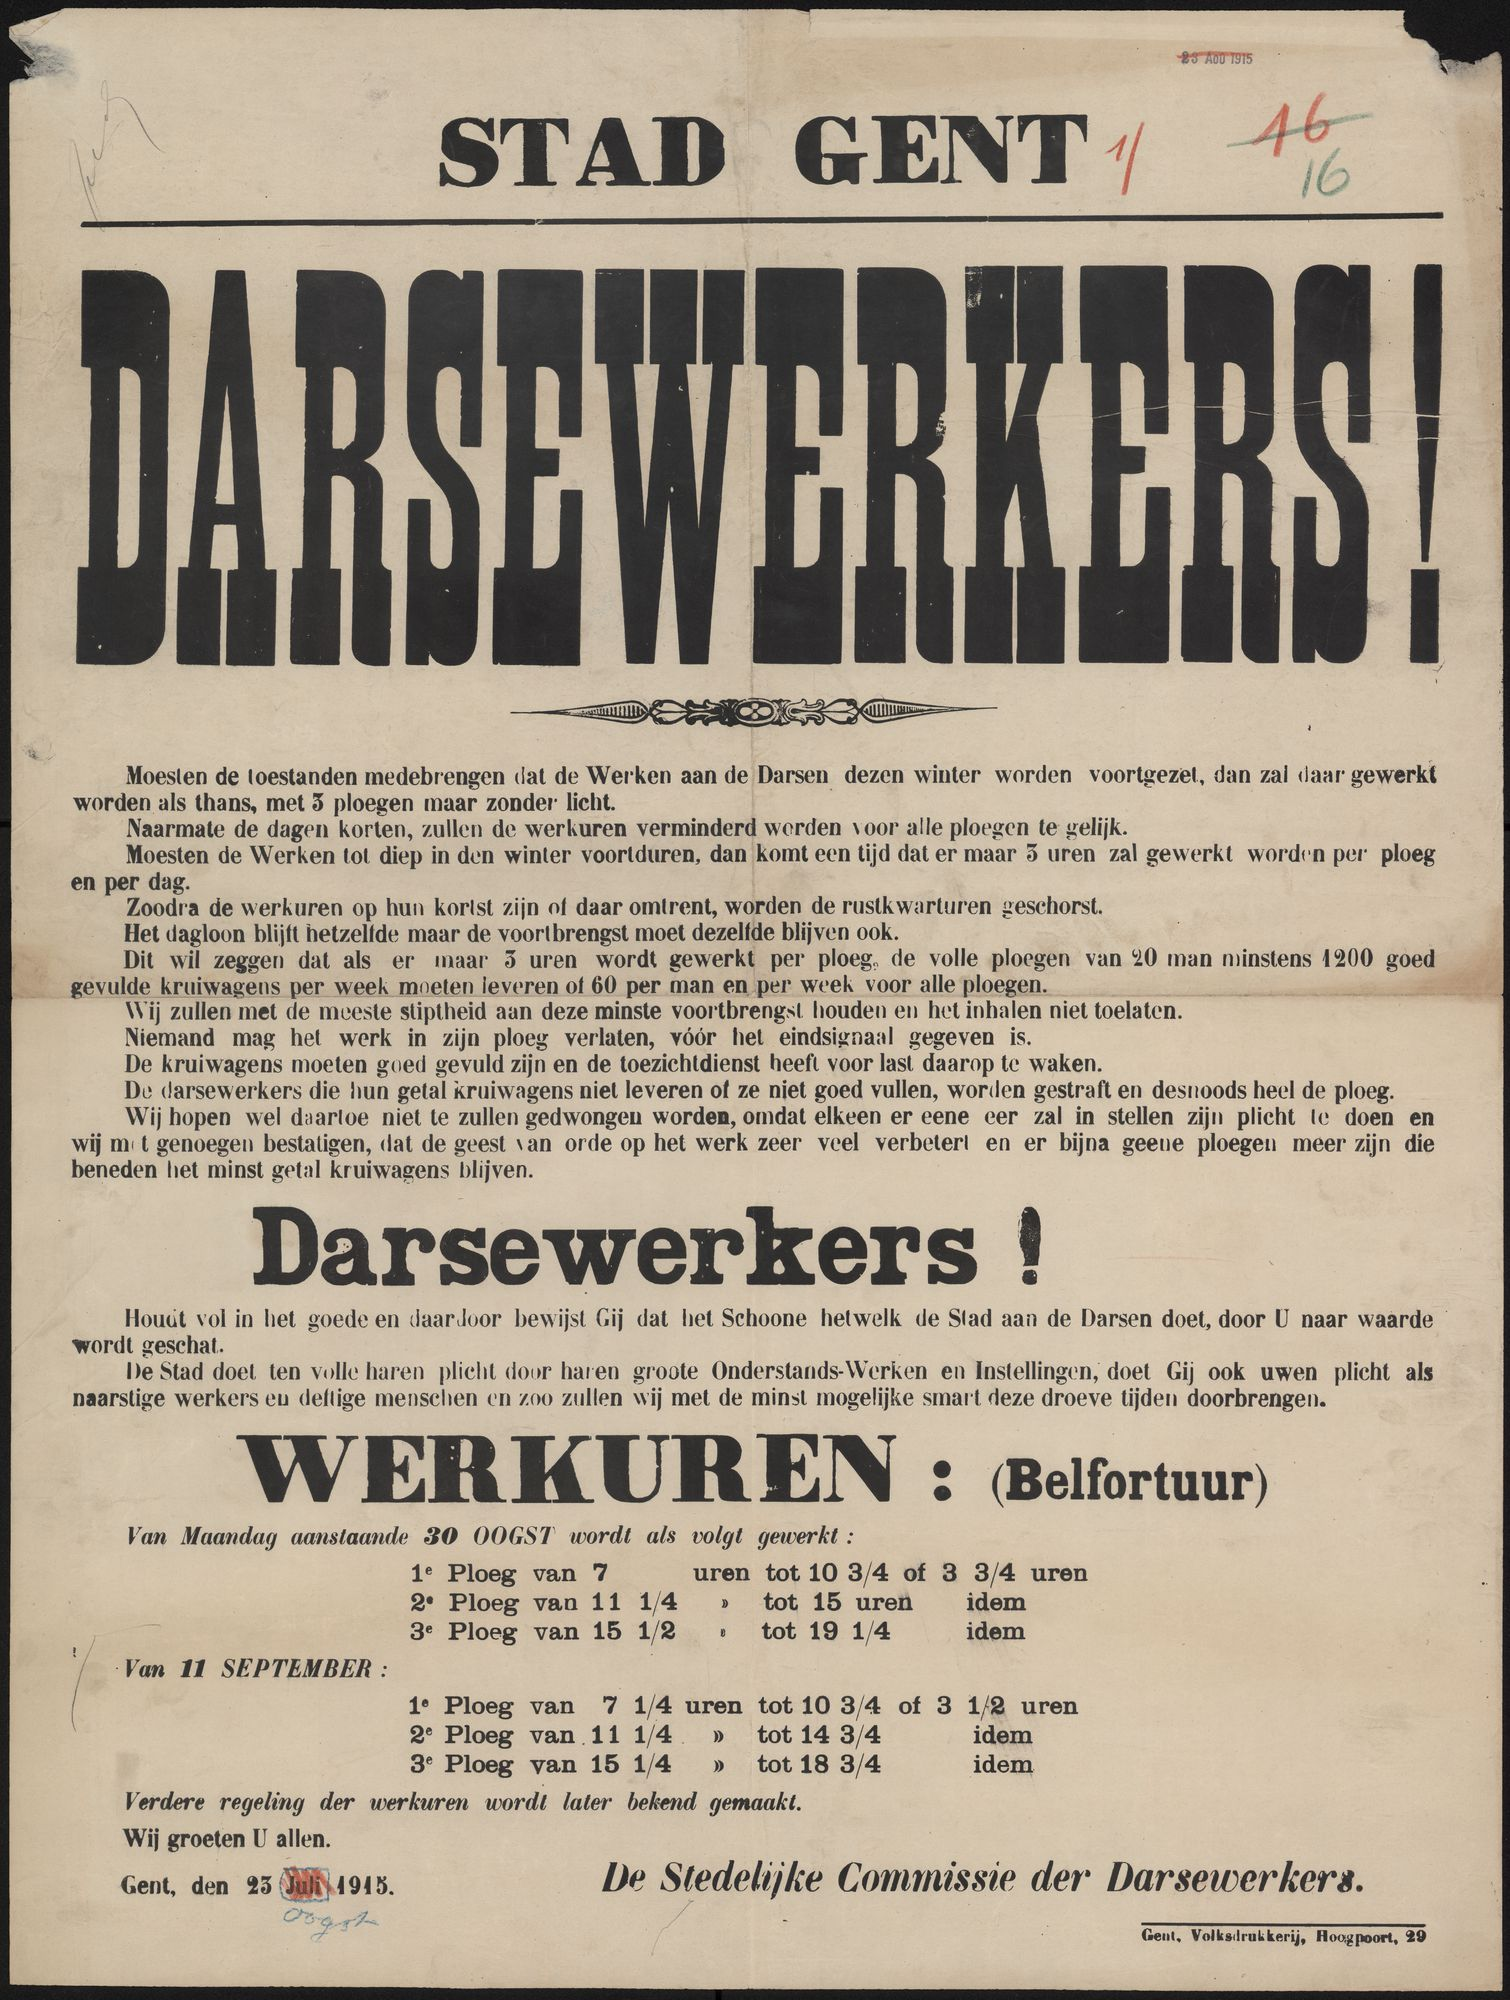 Stad Gent, Darsewerkers!